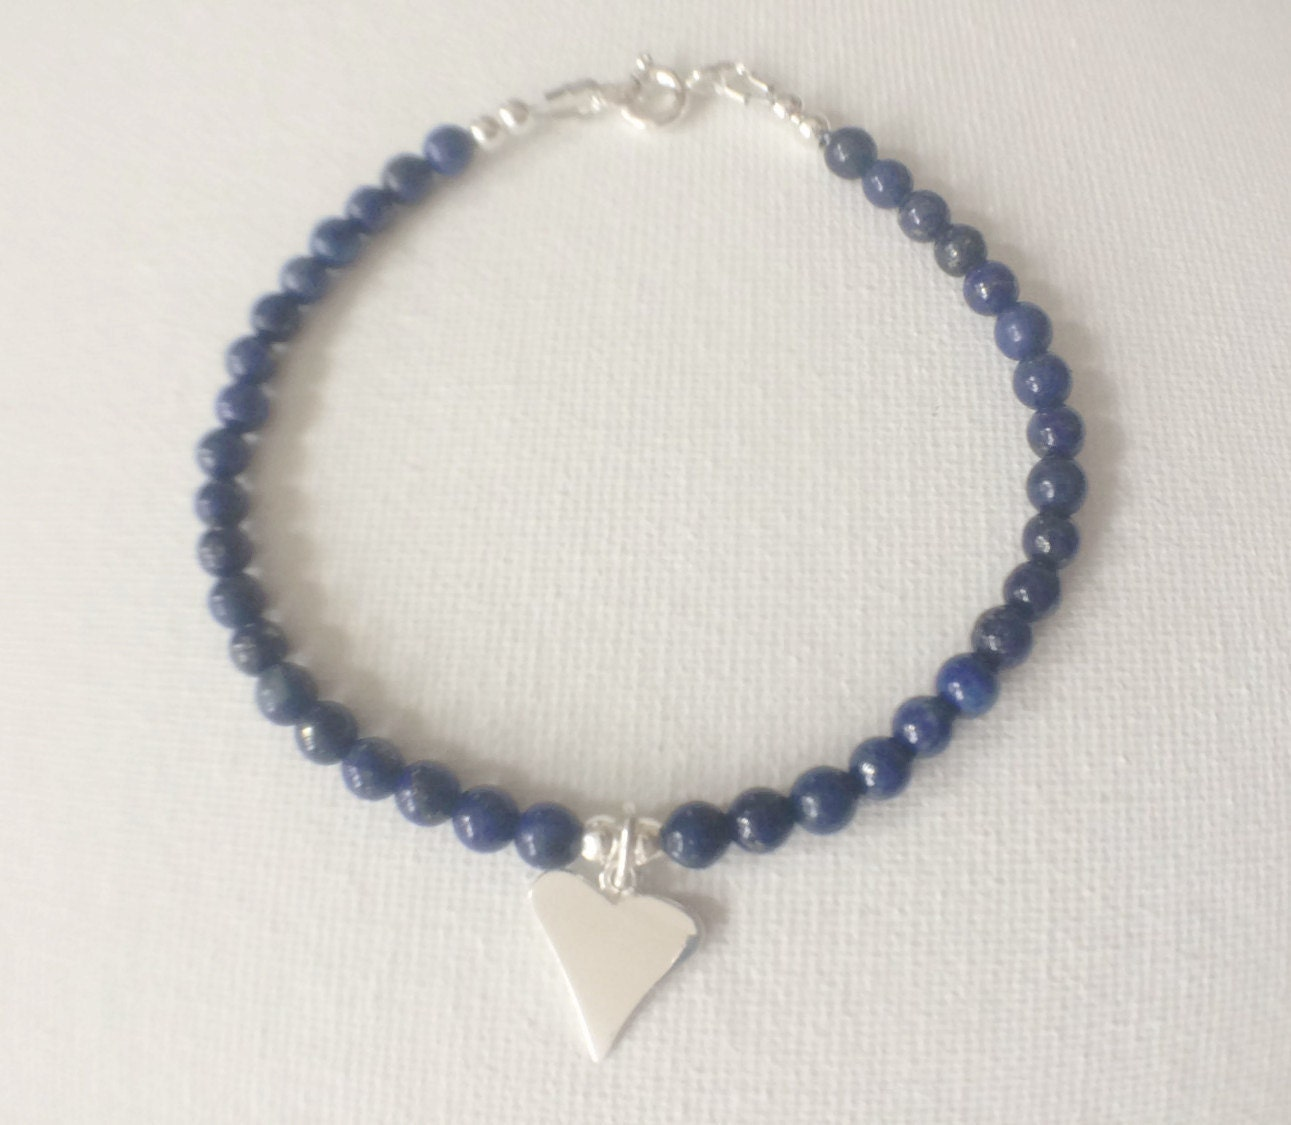 Blue Lapis Lazuli Charm Bracelet Lapis Lazuli  Heart Bracelet Lapis Lazuli Jewellery Personalised Jewellery Blue Gemstone Bracelet Gift